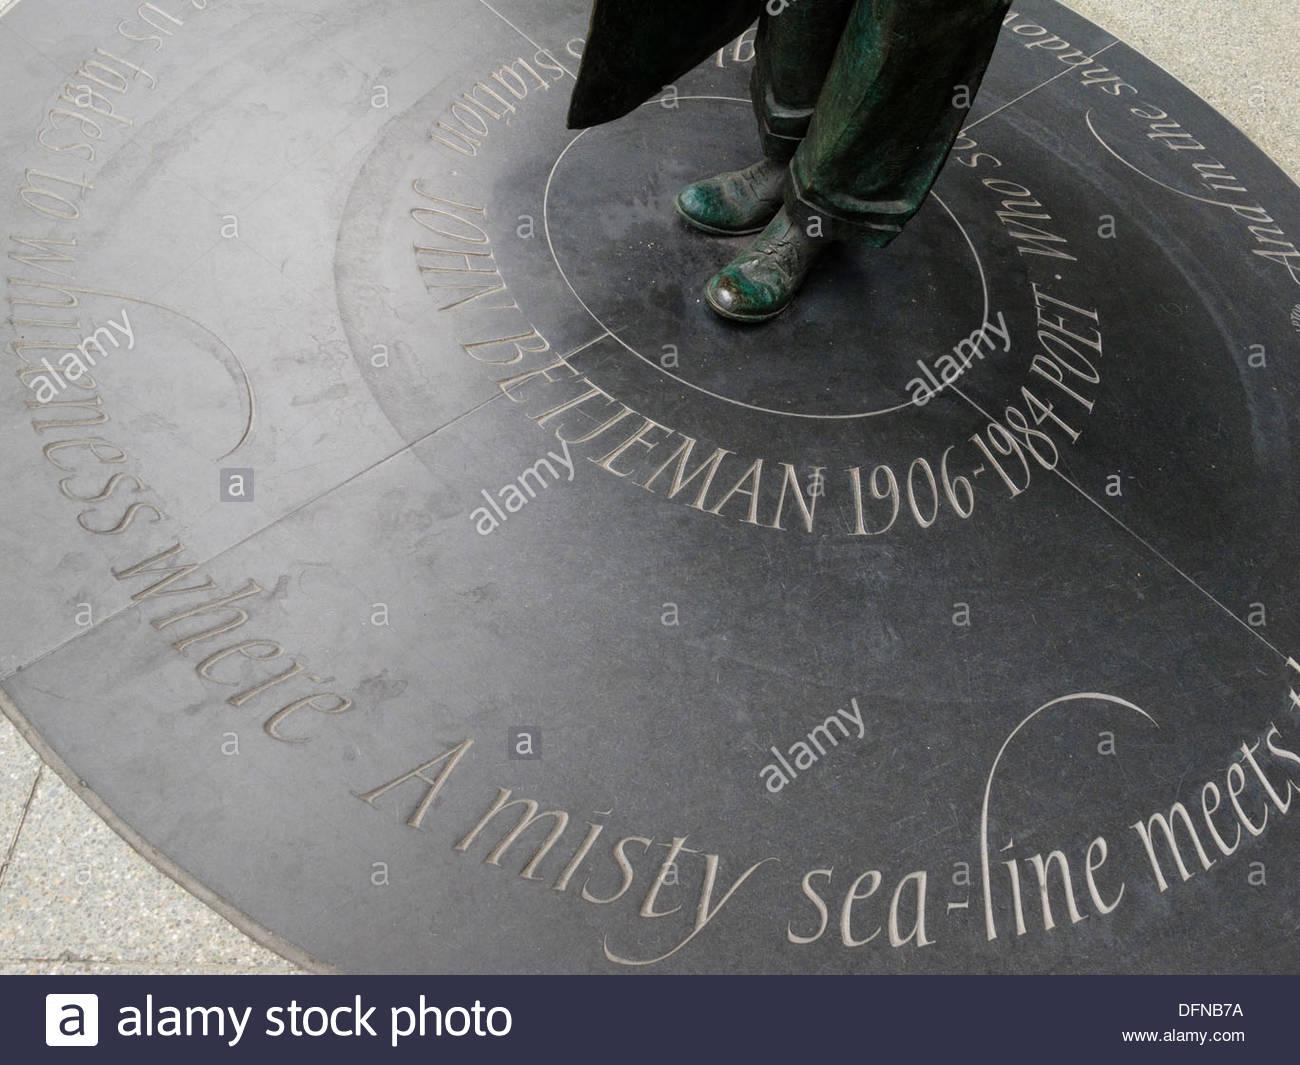 Sir John Betjeman Statue St Pancras International Railway Station London England - Stock Image